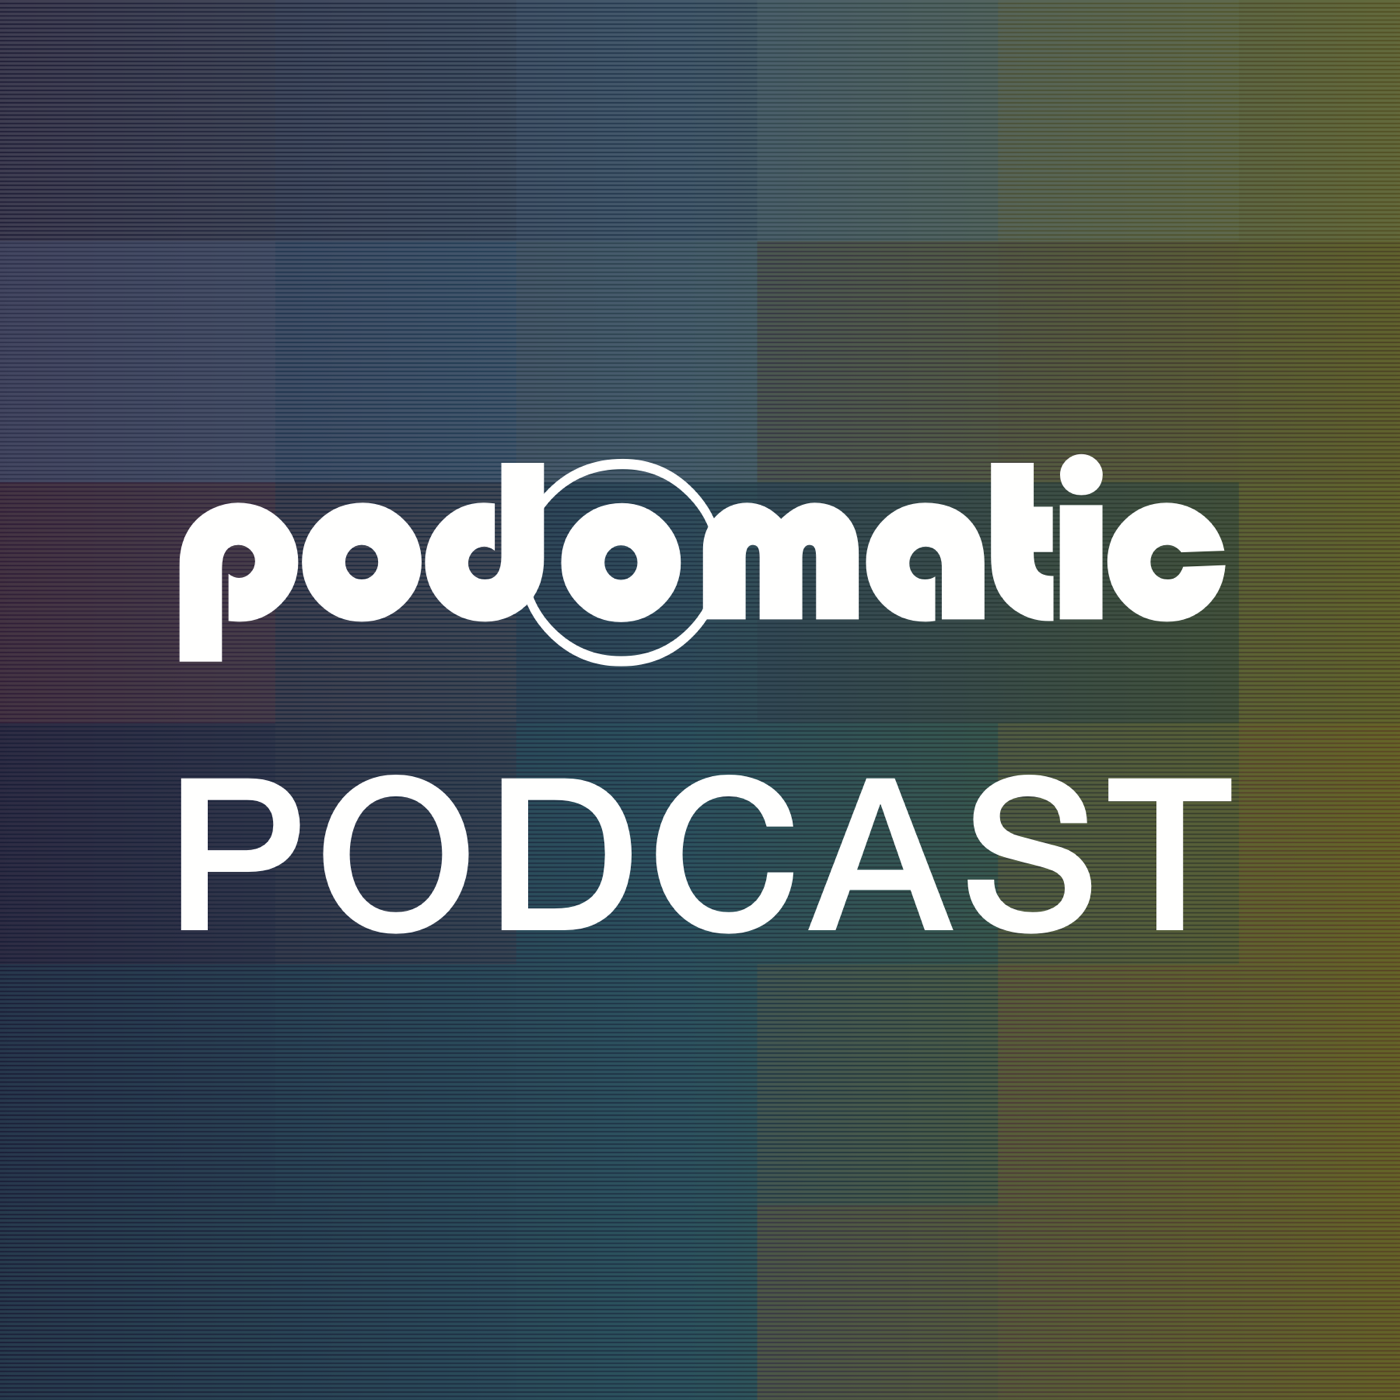 Jon Schwartz's Podcast